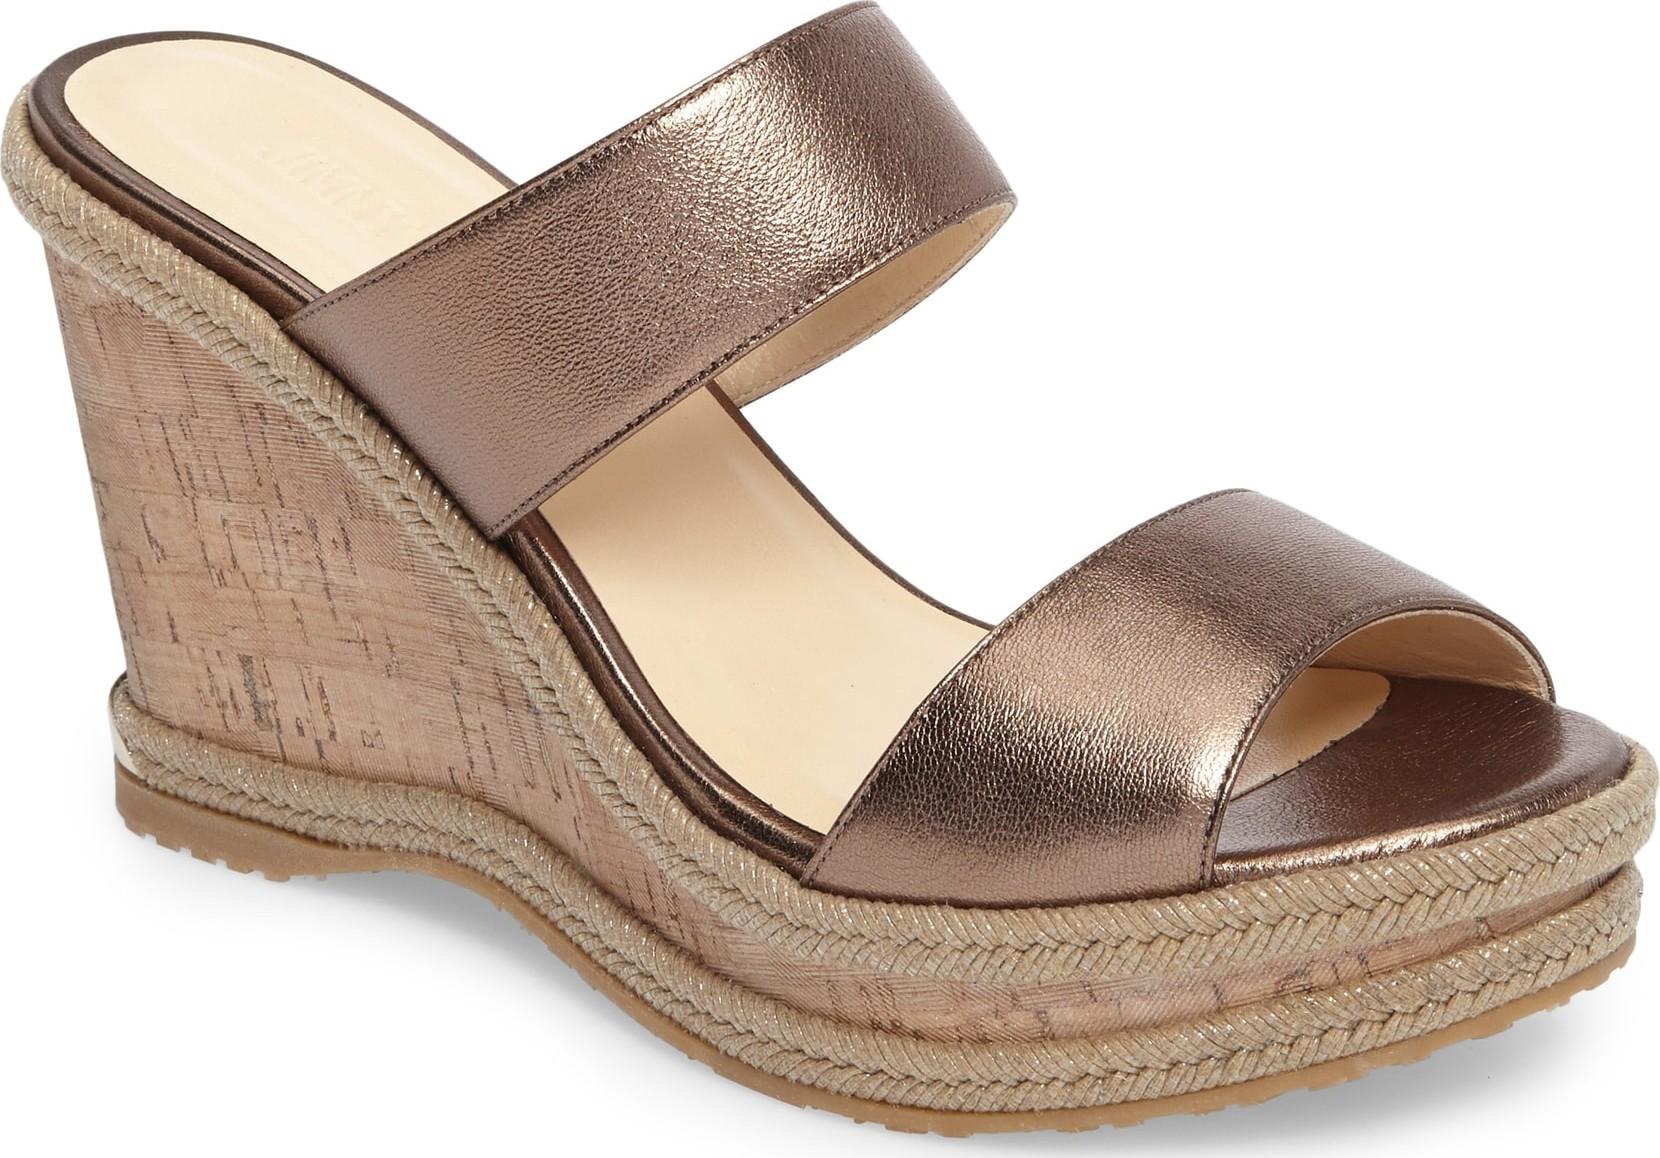 Jimmy Choo Parker Wedge Sandal - Luxed